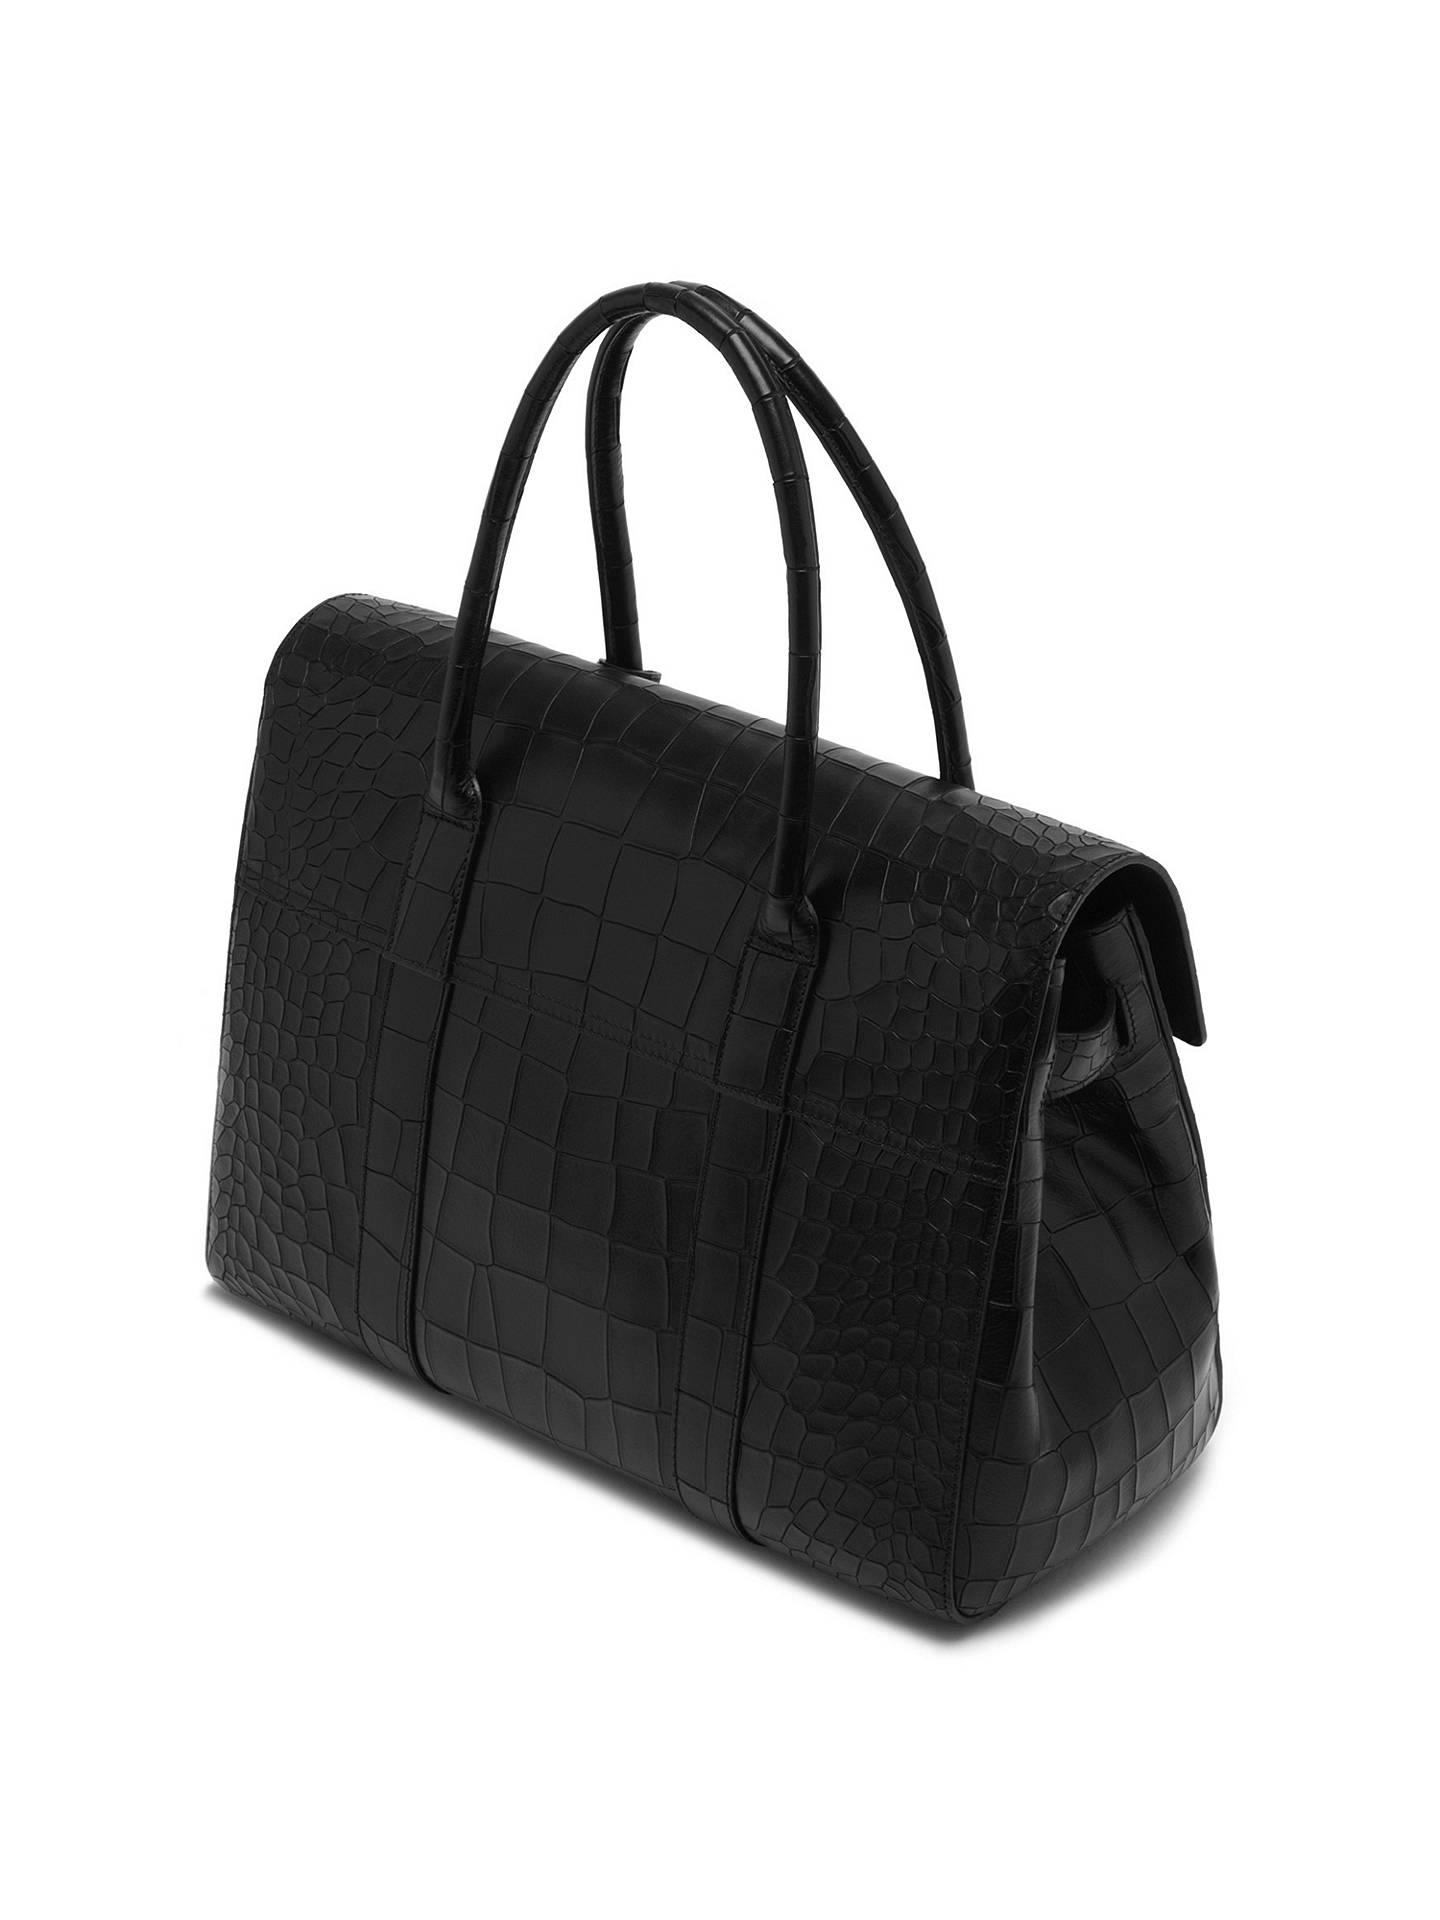 ... czech buymulberry bayswater leather croc print bag black online at  johnlewis 5c983 21c84 edd2e10f75ffe